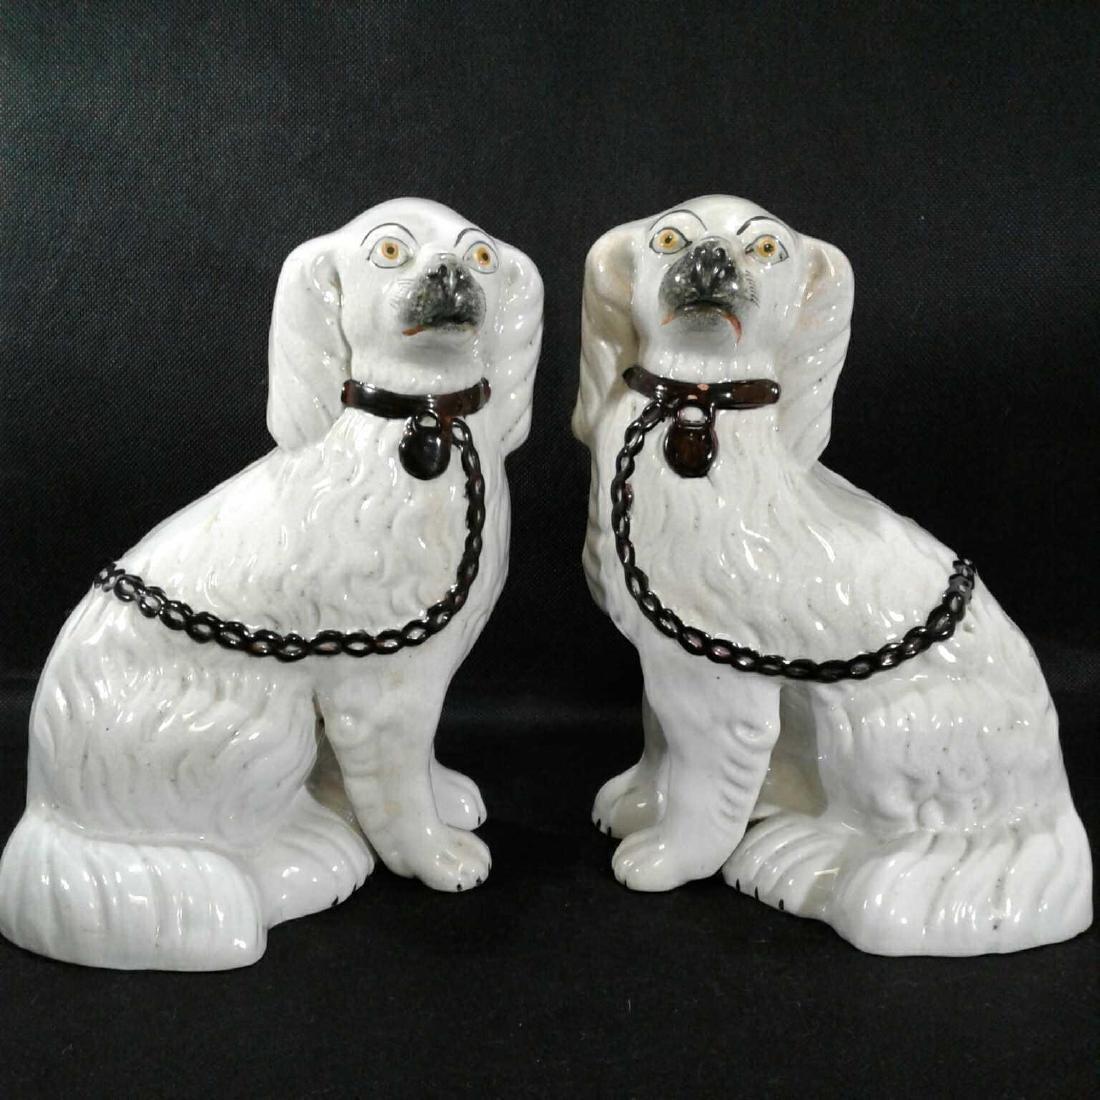 2 Staffordshire Porcelain White Spaniel Dogs Figurines